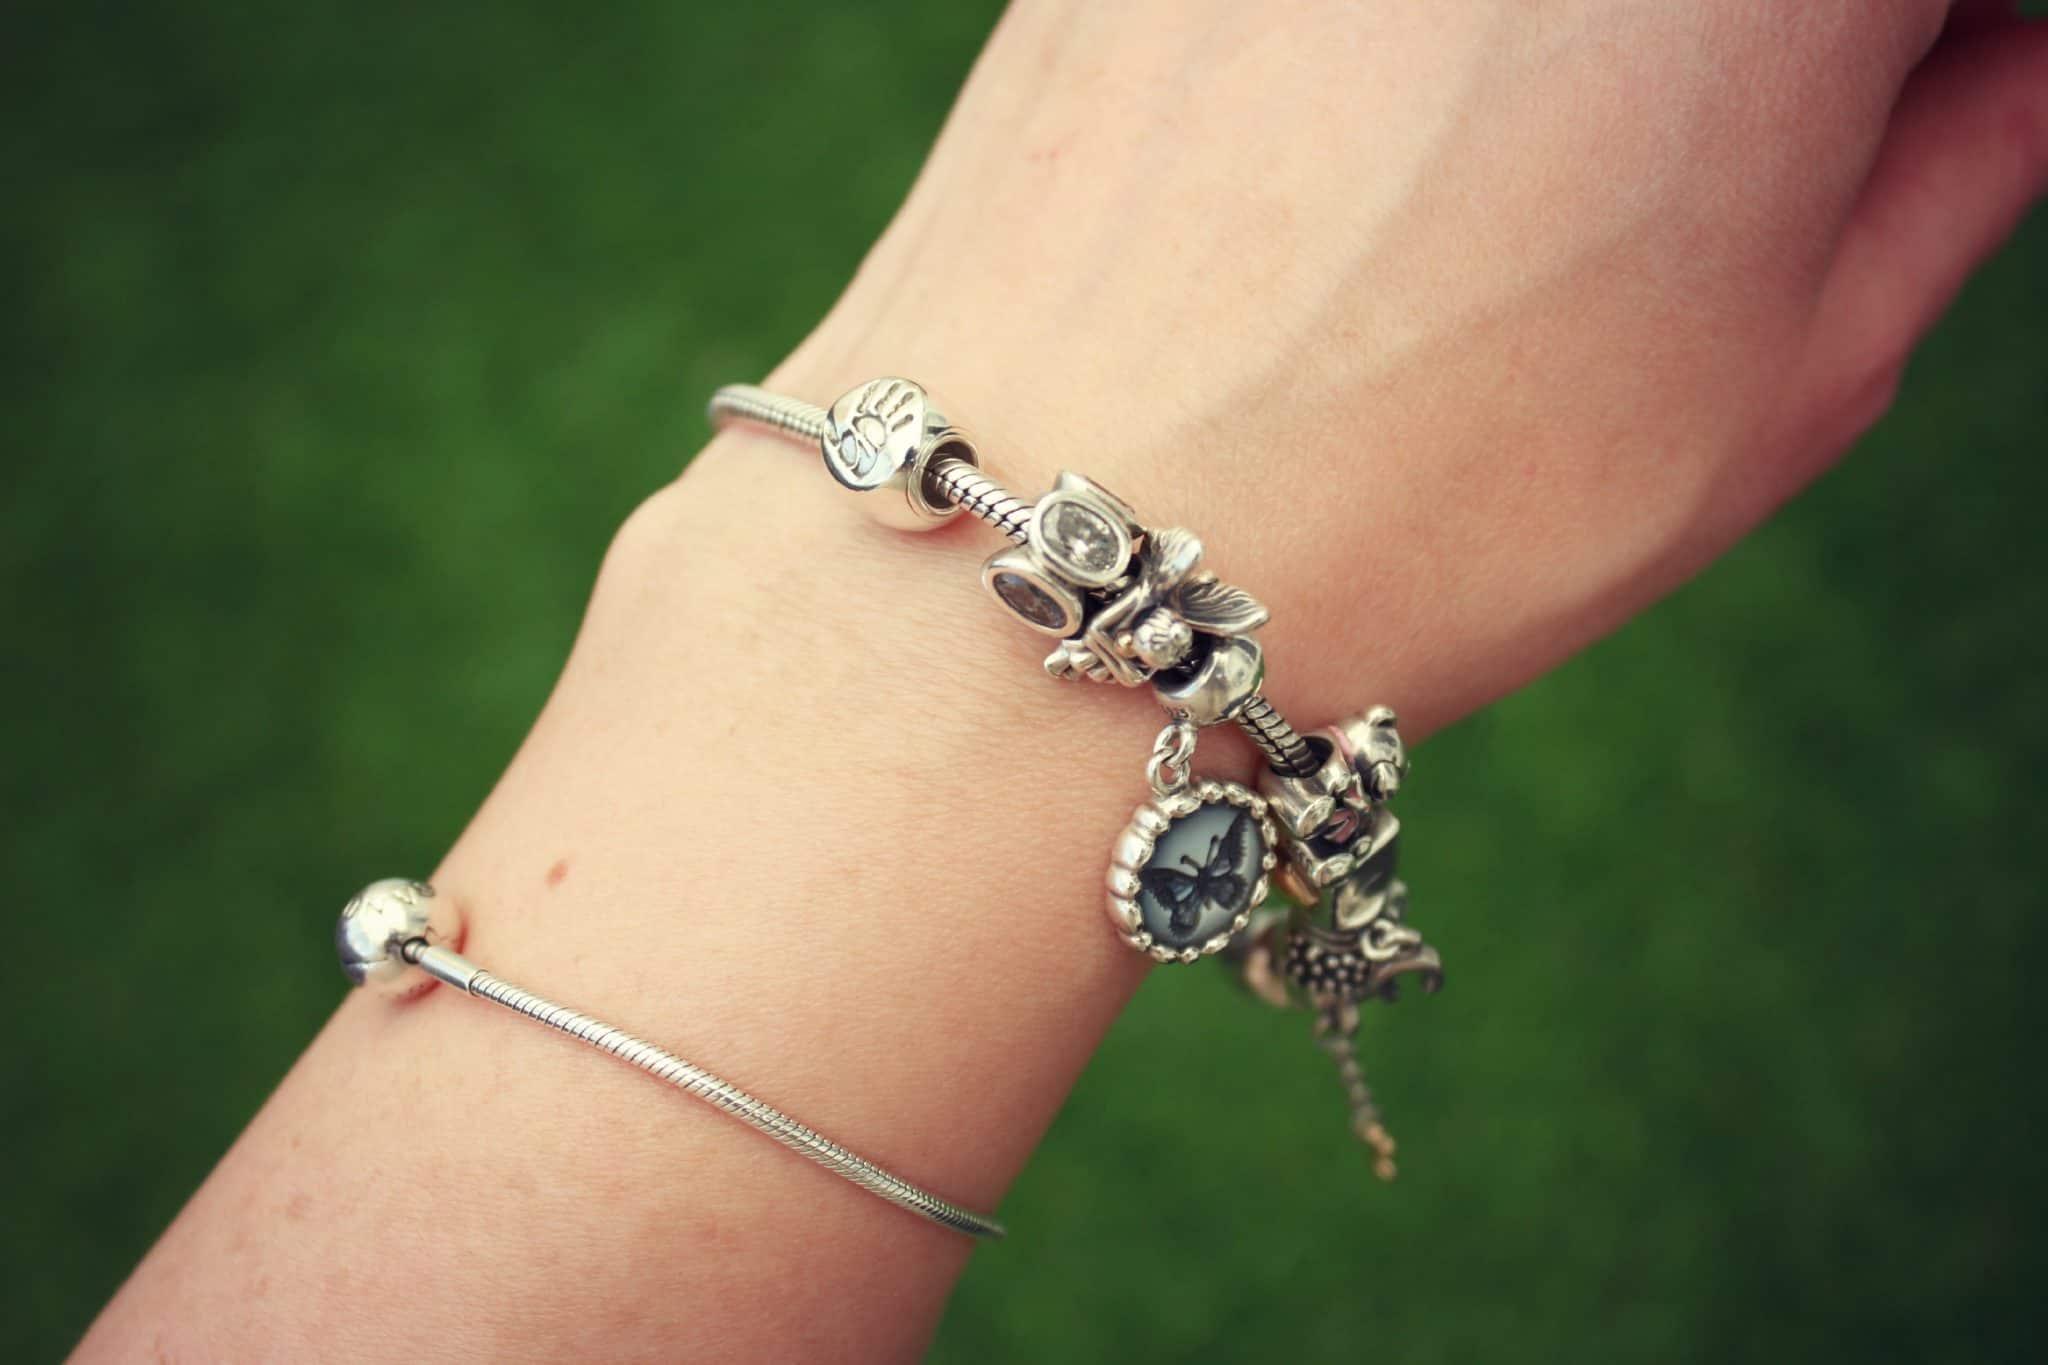 How To Put On A Pandora Bracelet